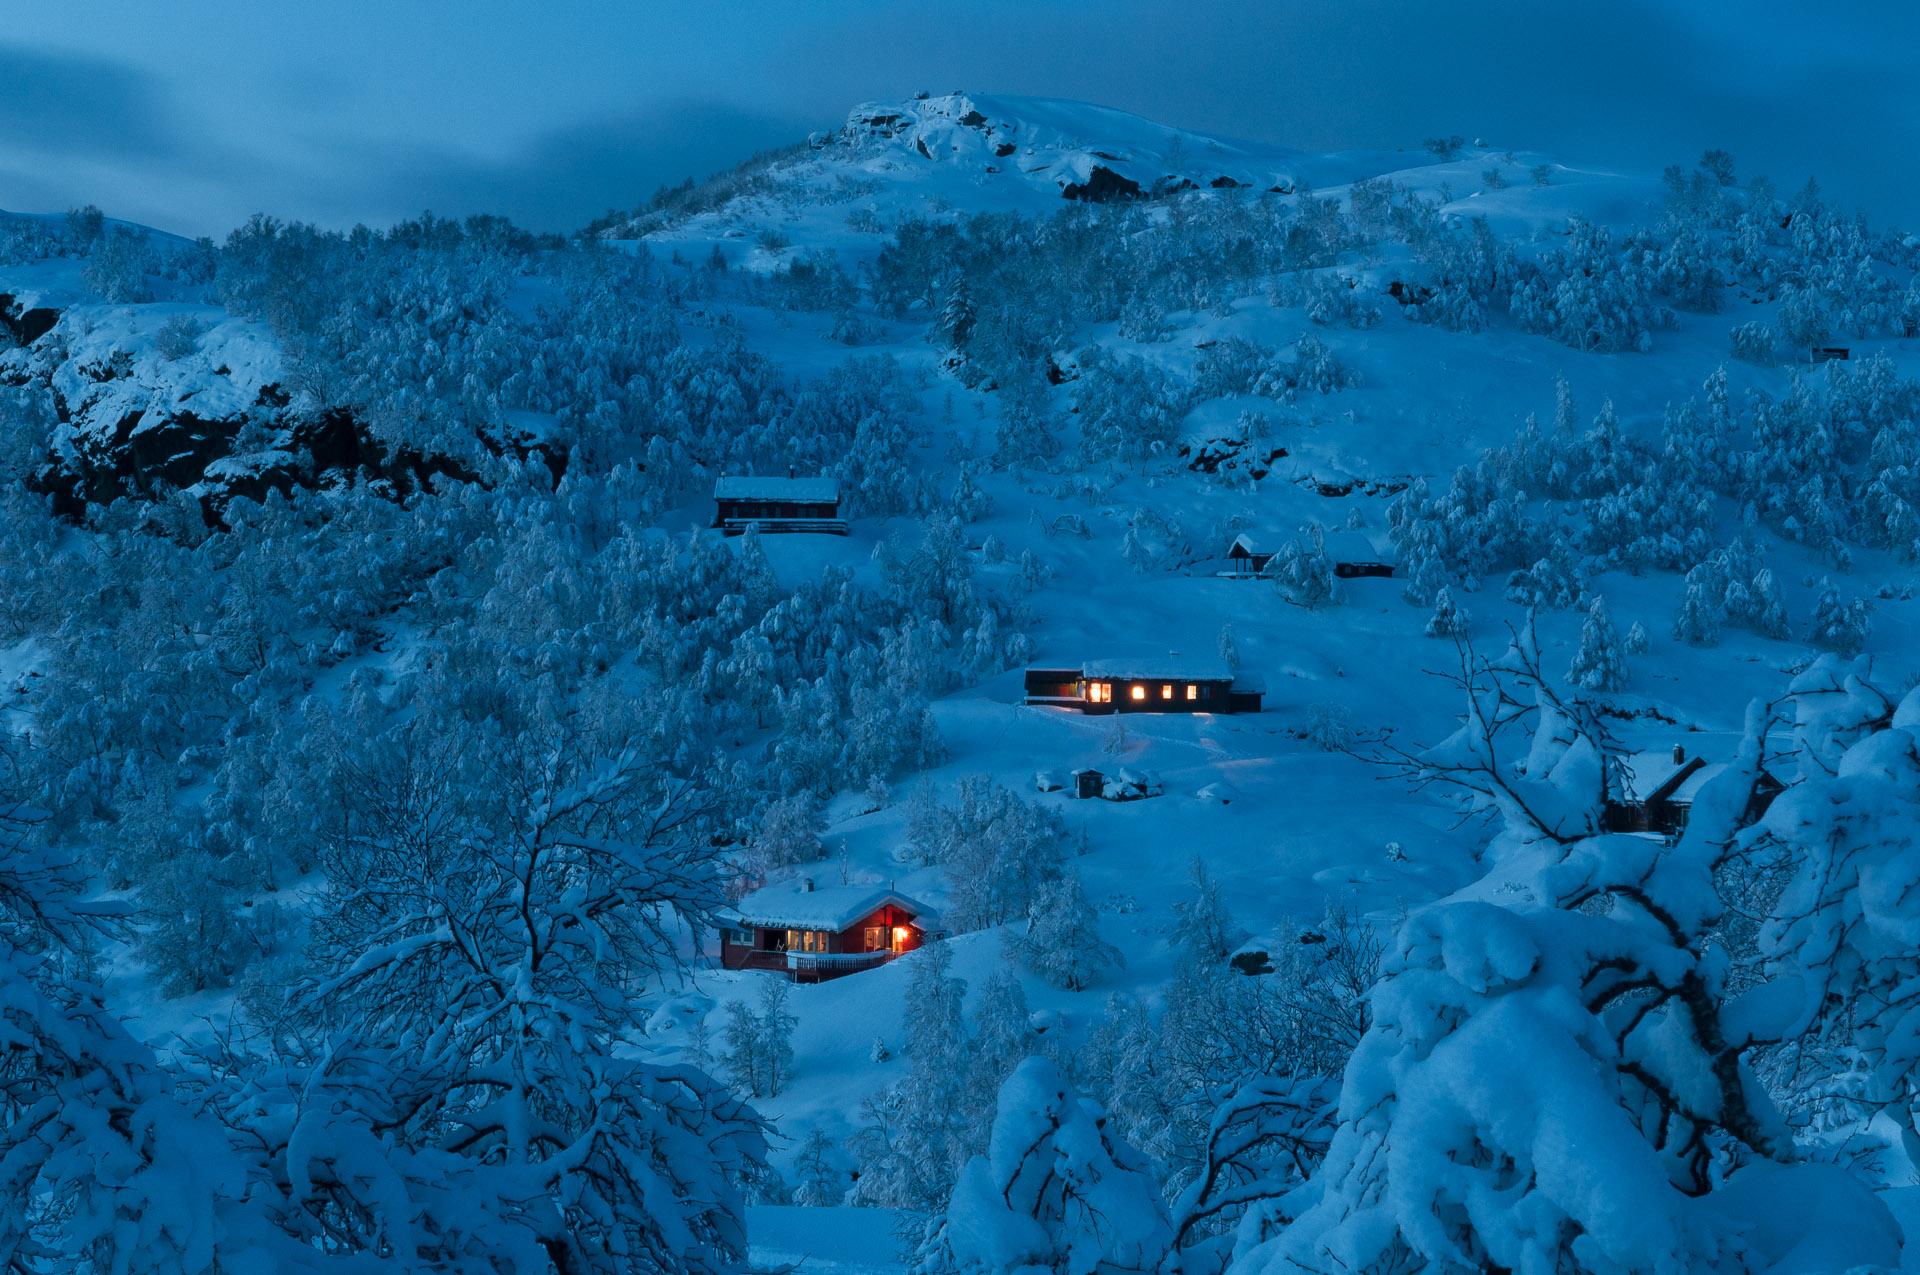 Foto: Kjetil Brekke/SuldalFoto.no